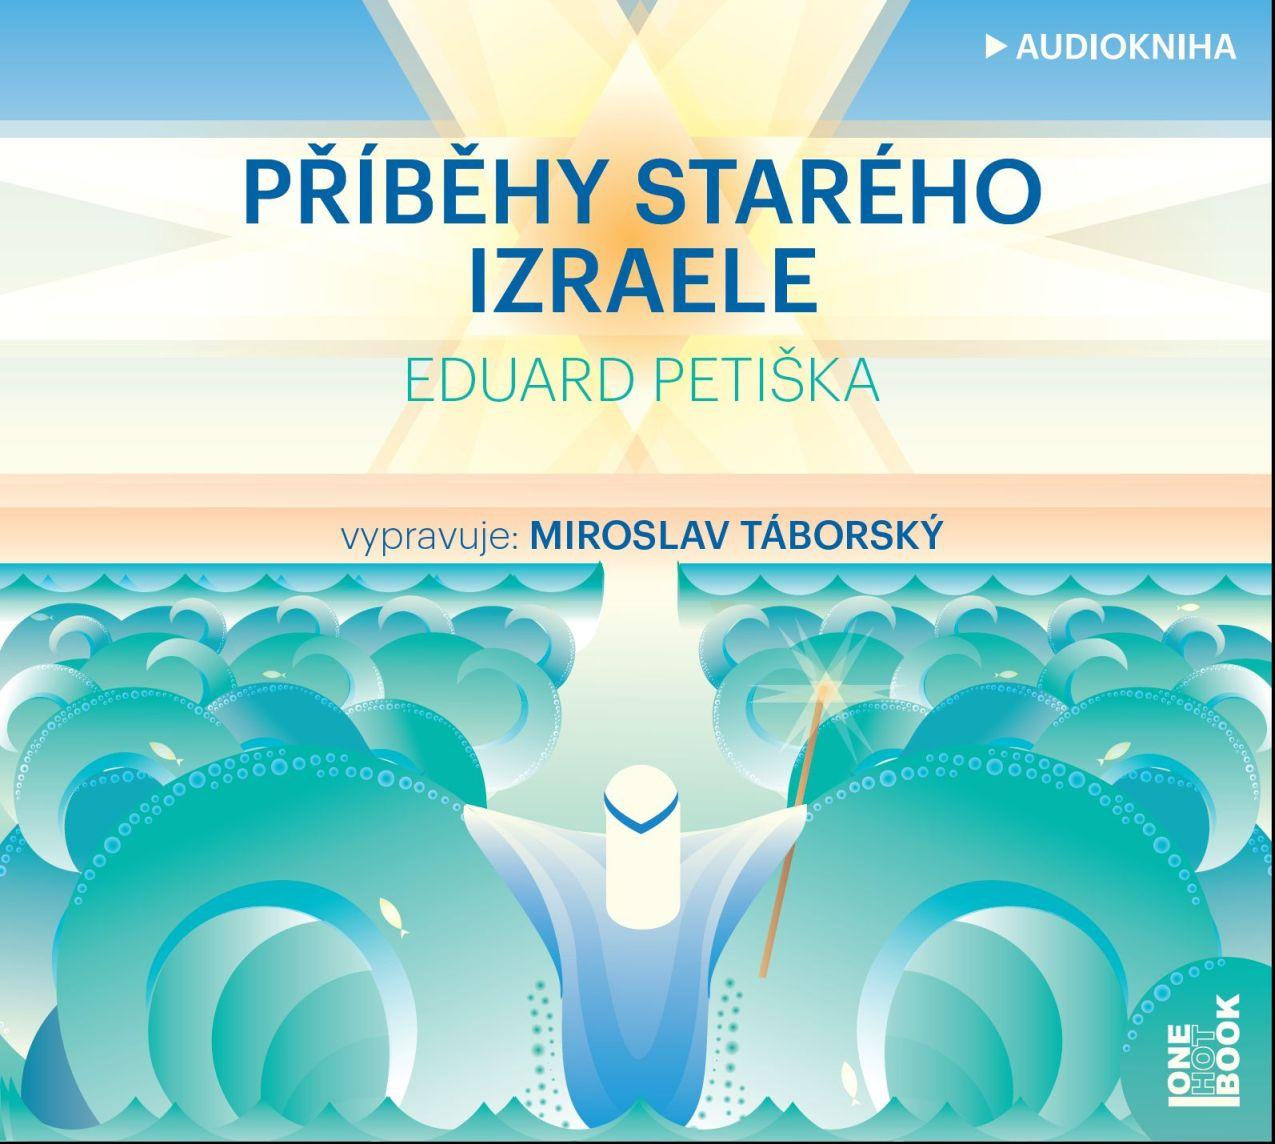 Audiokniha Příběhy starého Izraele